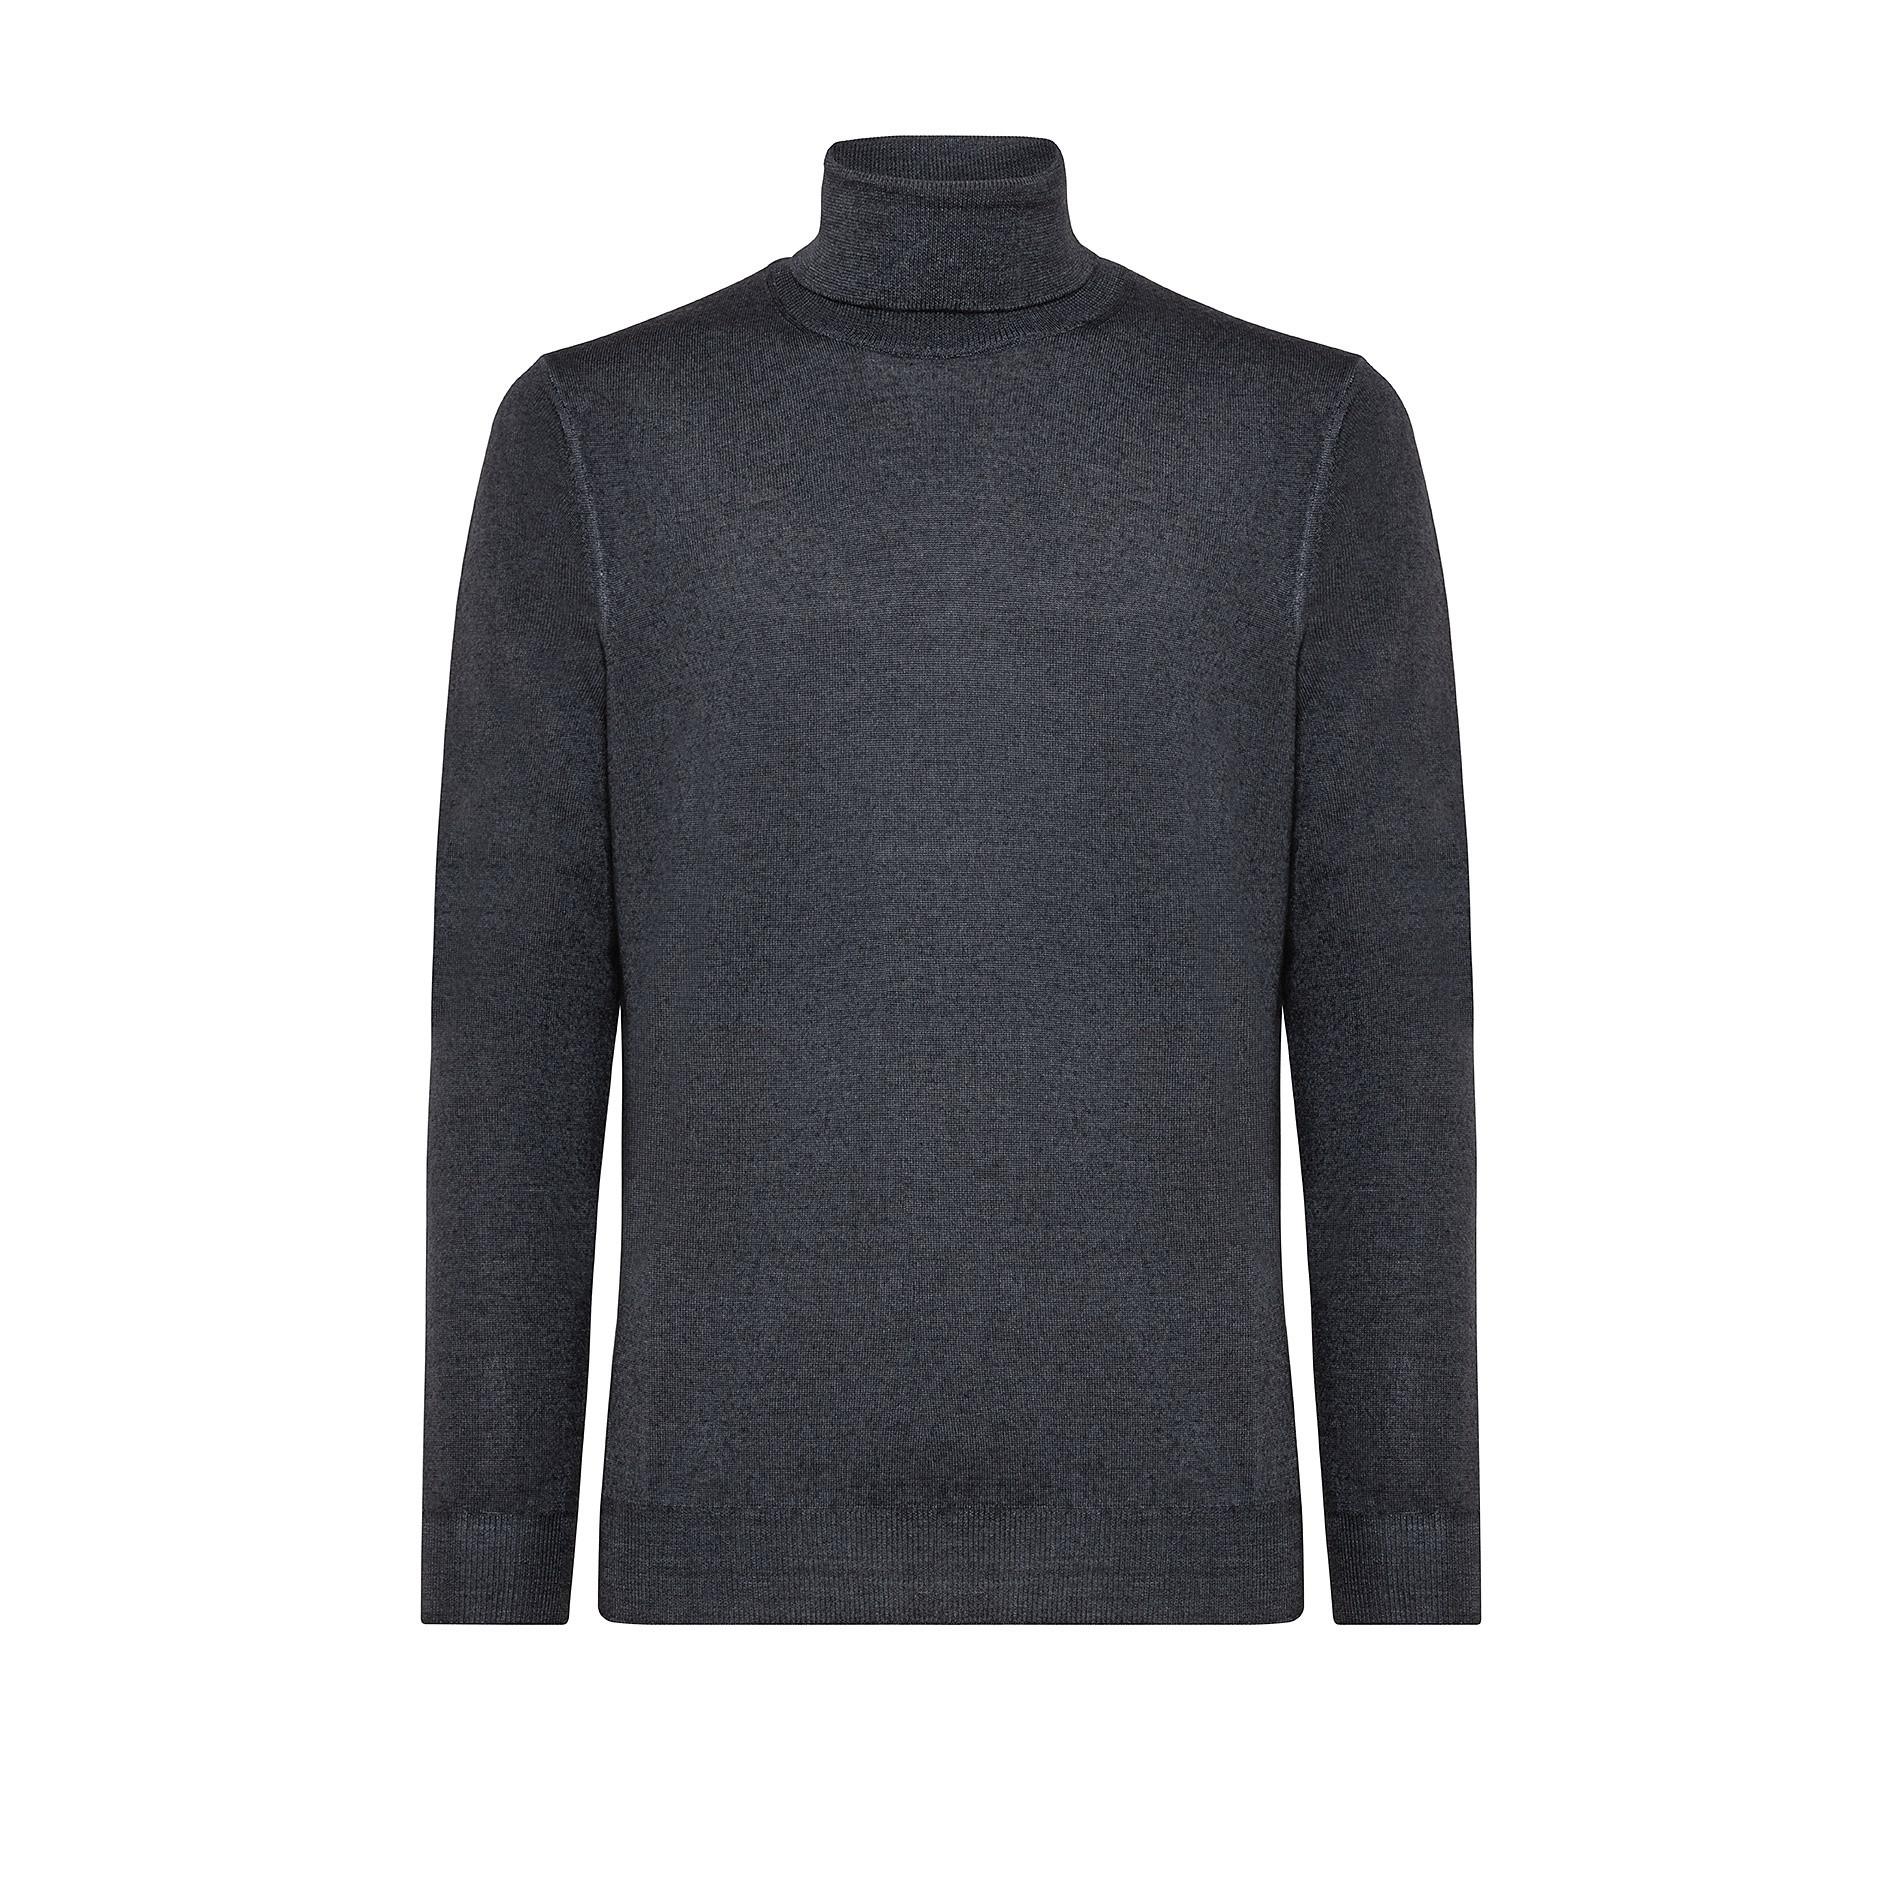 Pullover lana merinos collo alto, Grigio, large image number 0